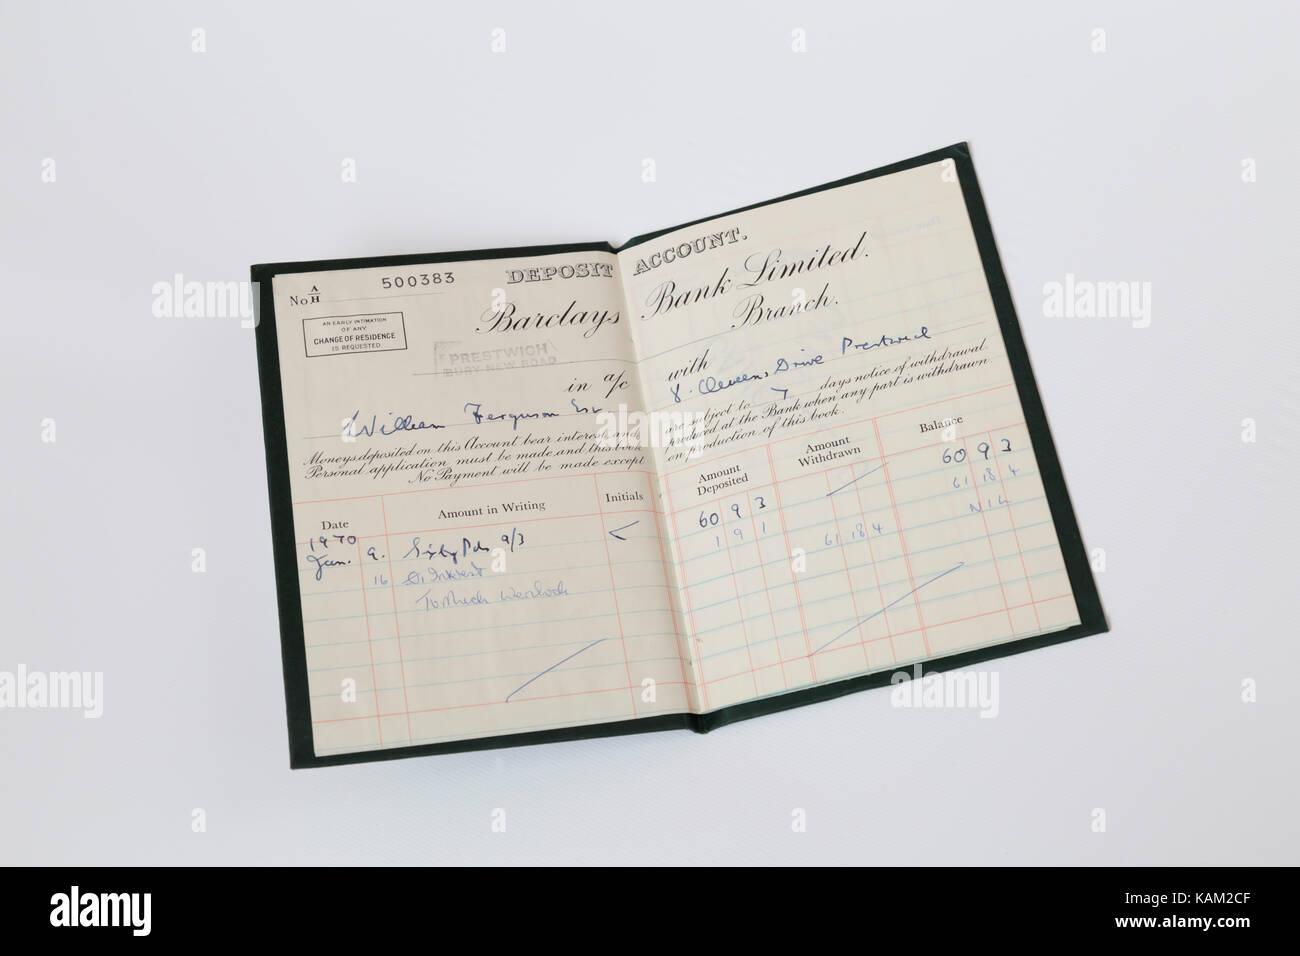 1970s bank deposit book - Stock Image